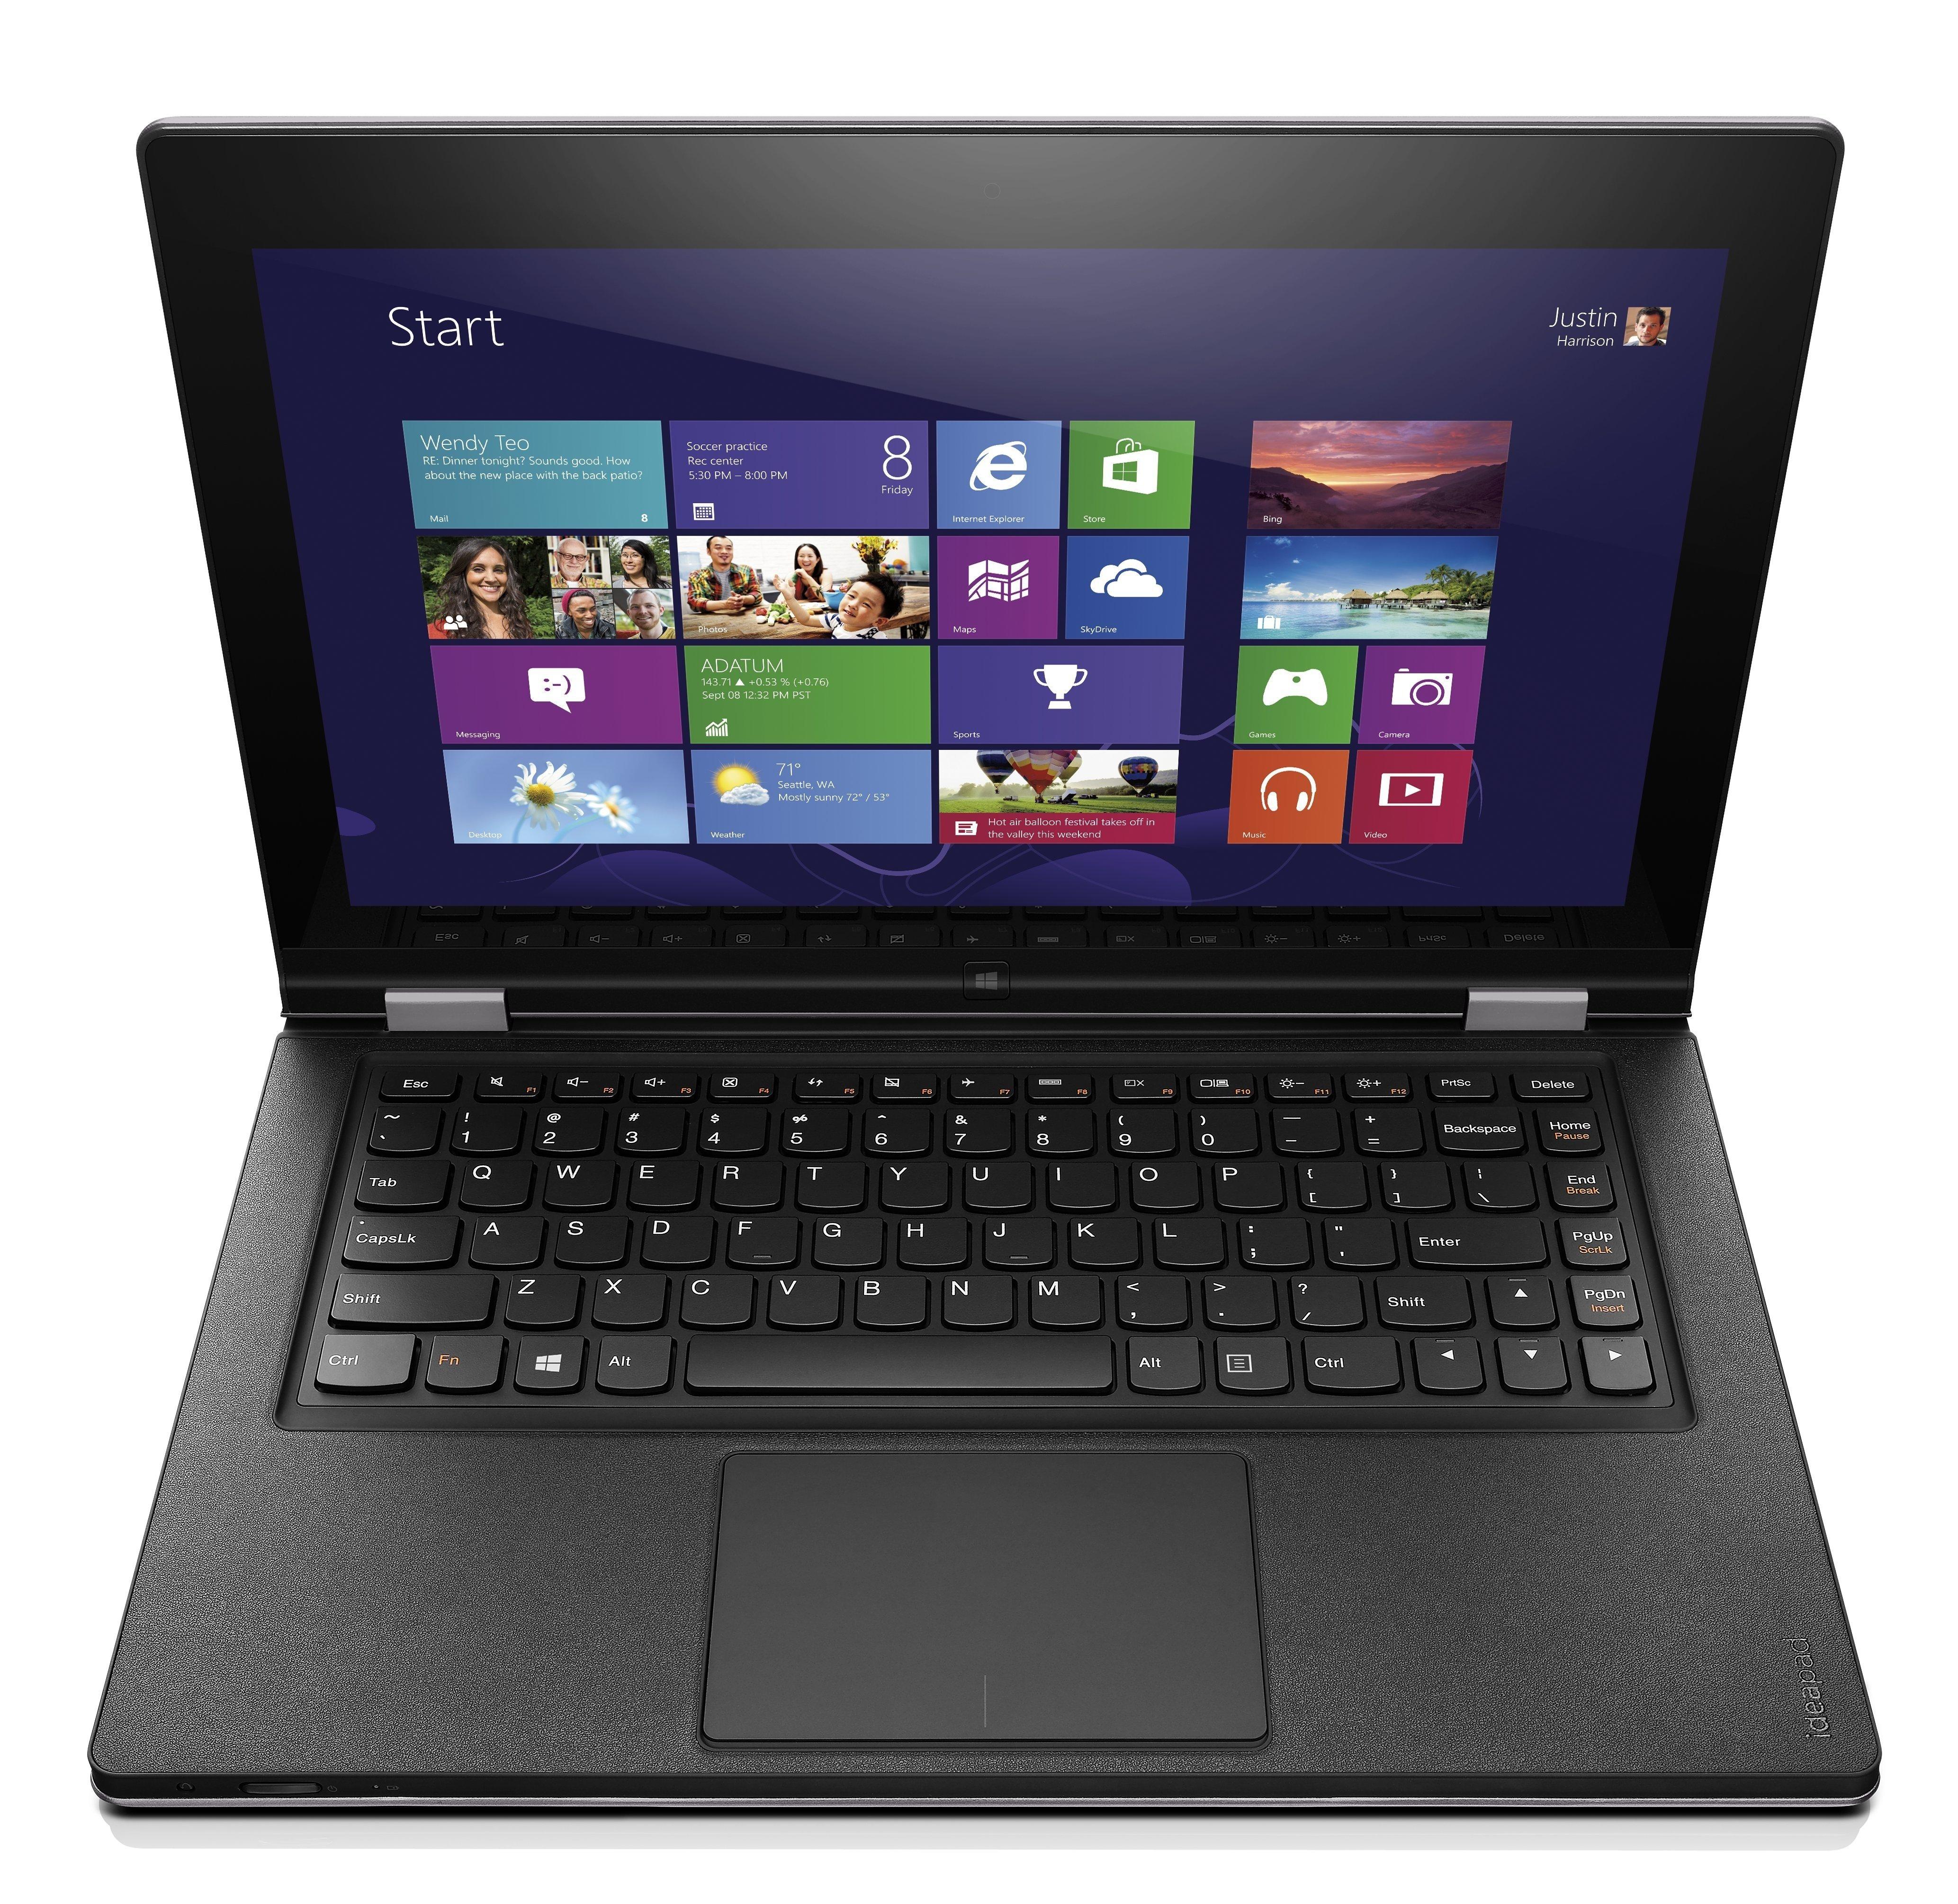 10 Spectacular Lenovo Idea Pad Yoga 13 lenovo ideapad yoga 13 arrives in october for 1099